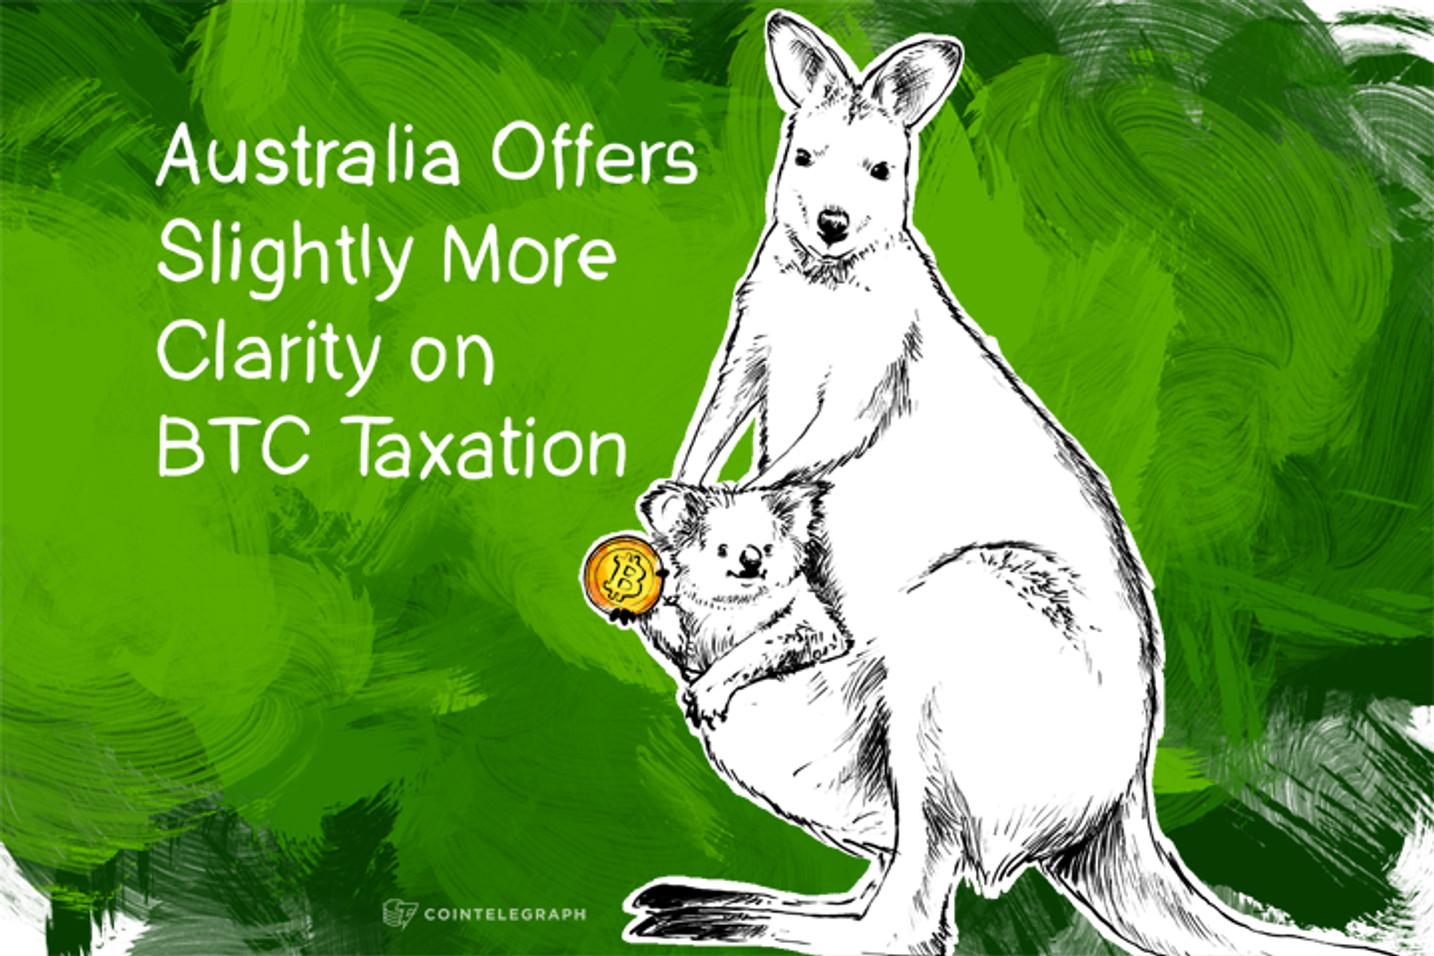 Australia Offers Slightly More Clarity on BTC Taxation